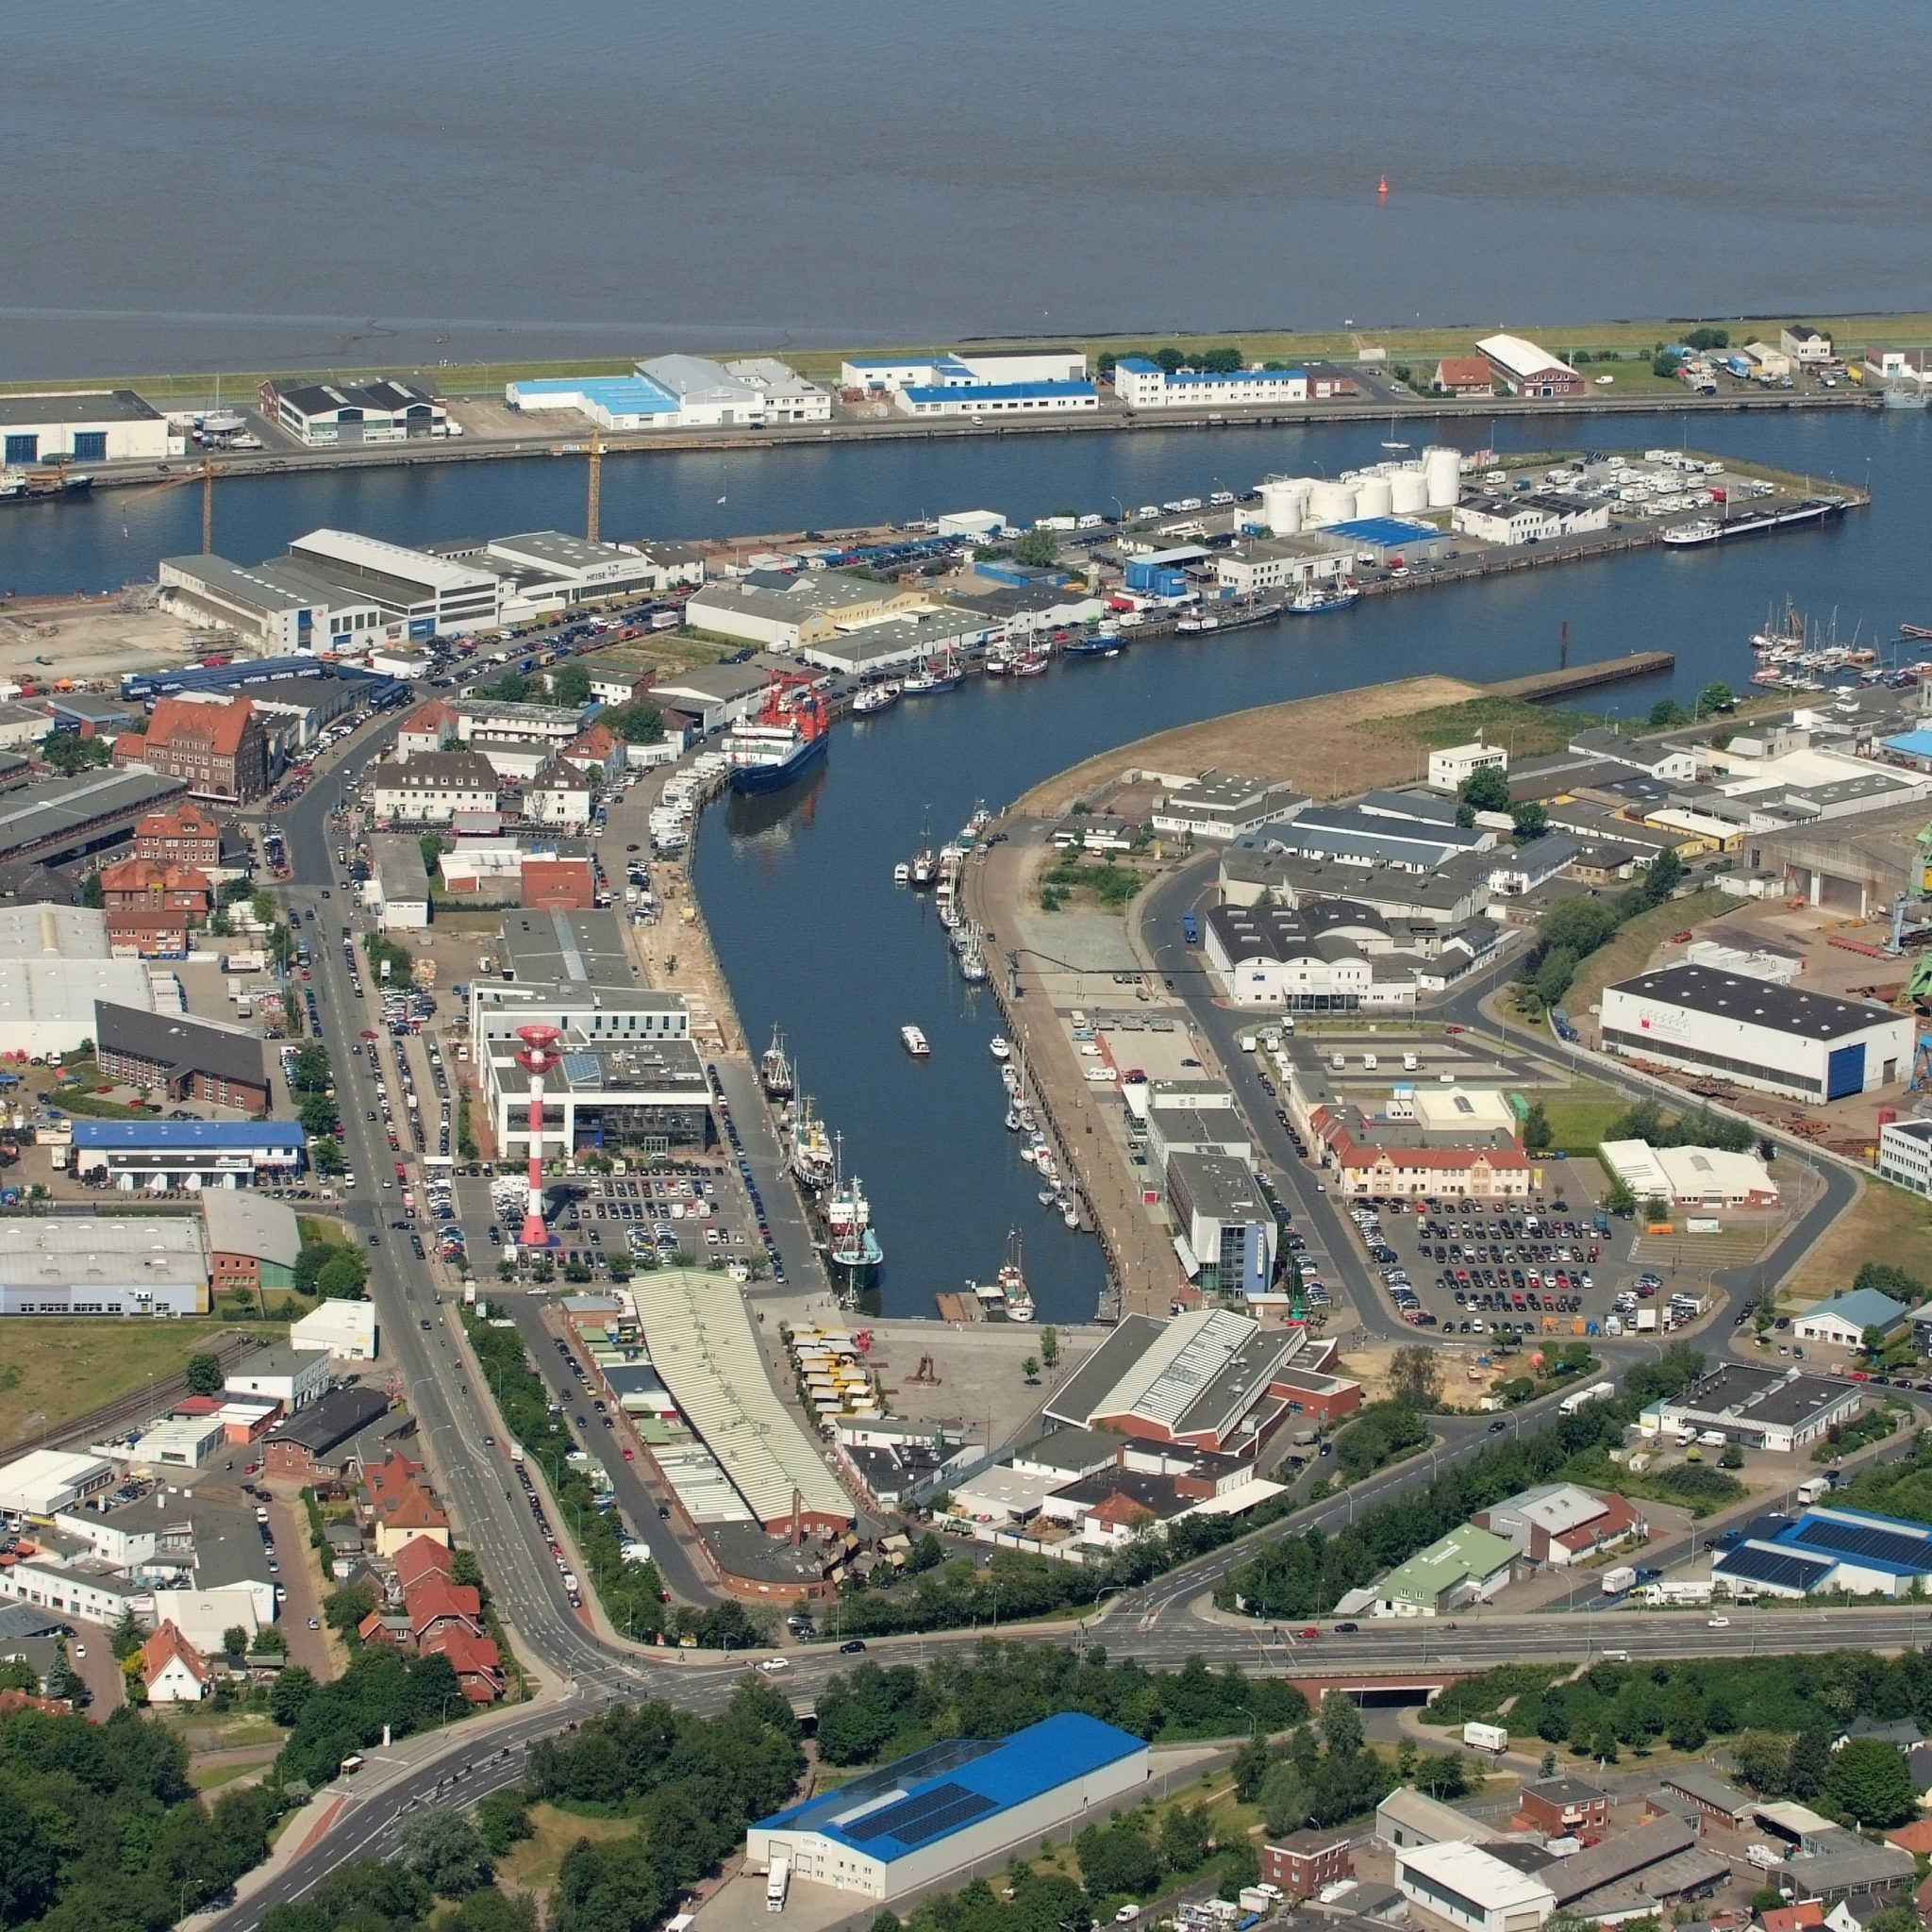 BOO2135 Fischereihaven Bremerhaven (Foto Wikimedia Commons/Martina Nolte)